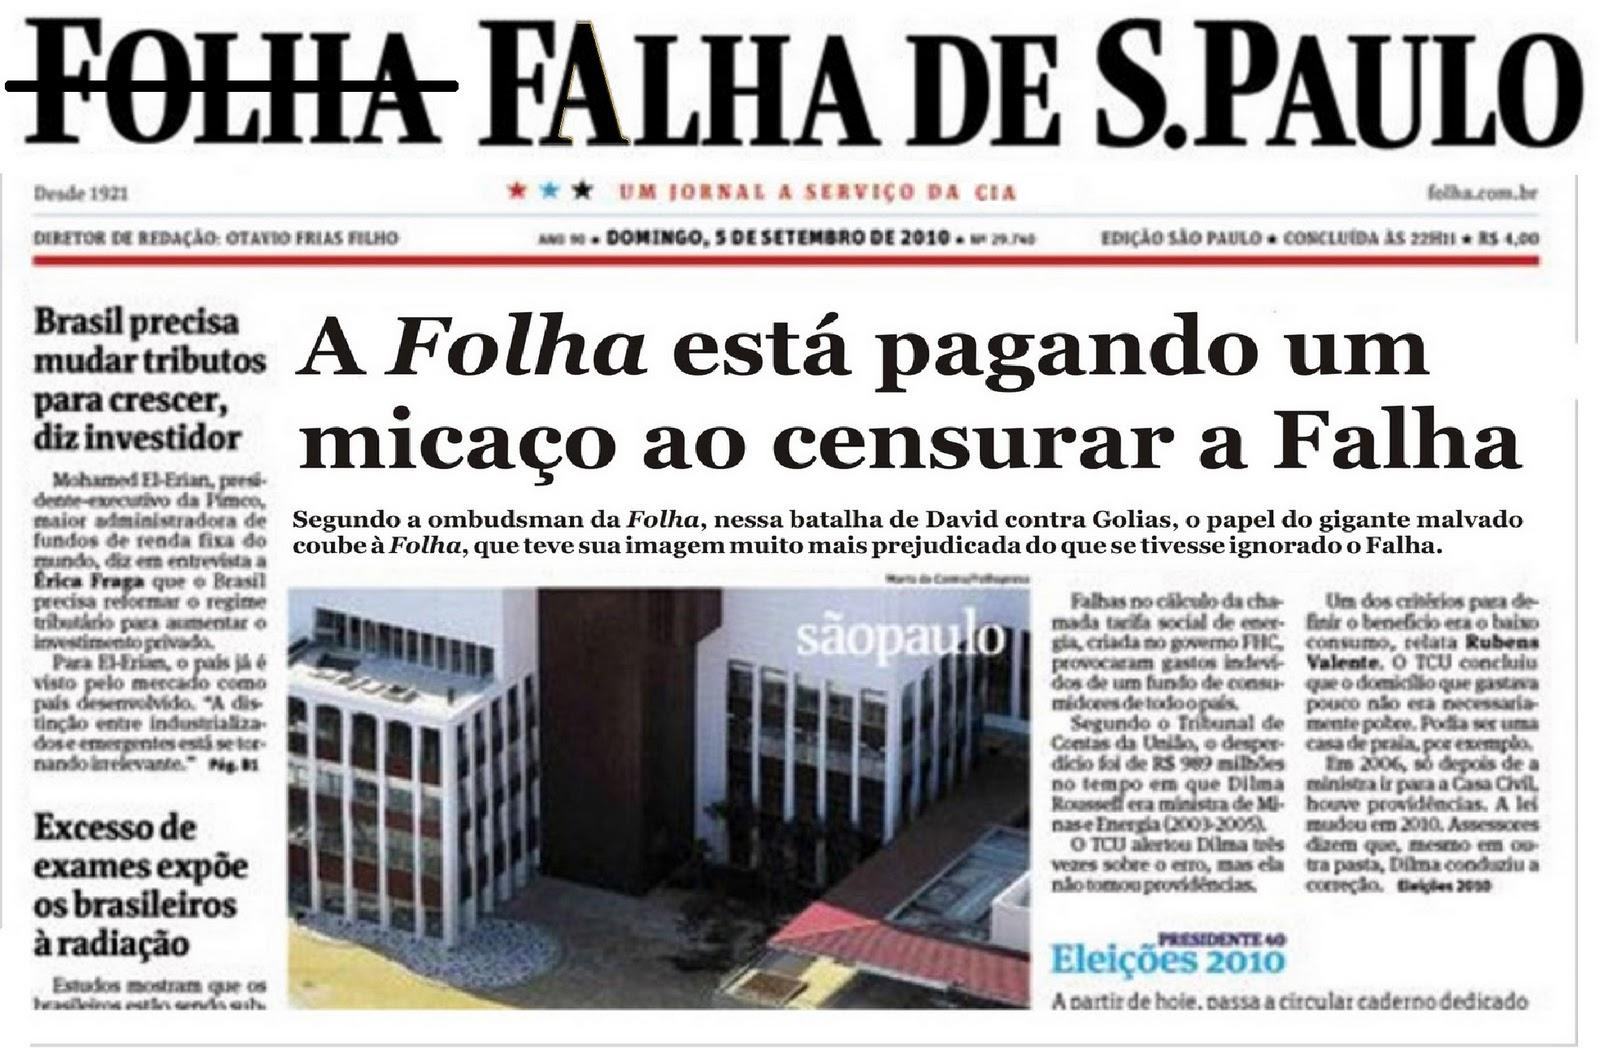 folha sao paulo: